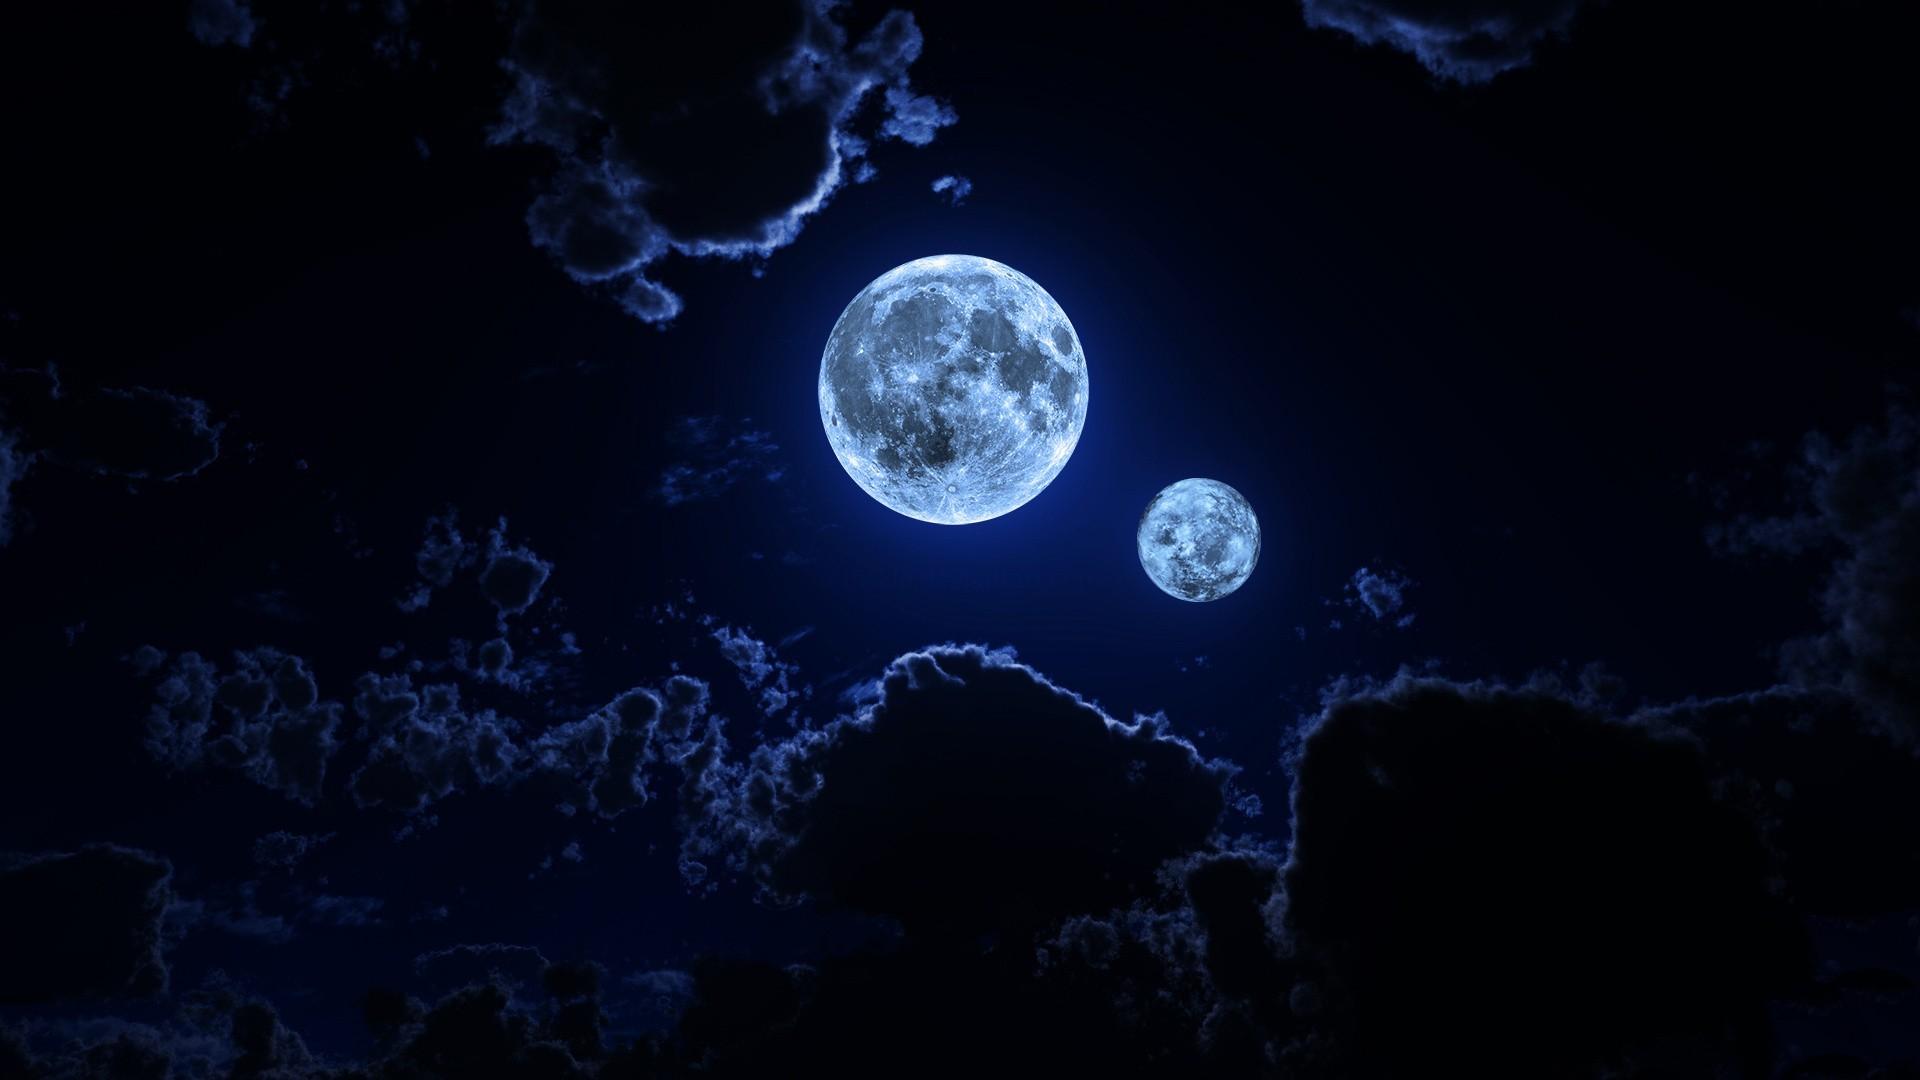 Nature Night Sky Images Cloud Moon Wallpaper Moon Wallpaper